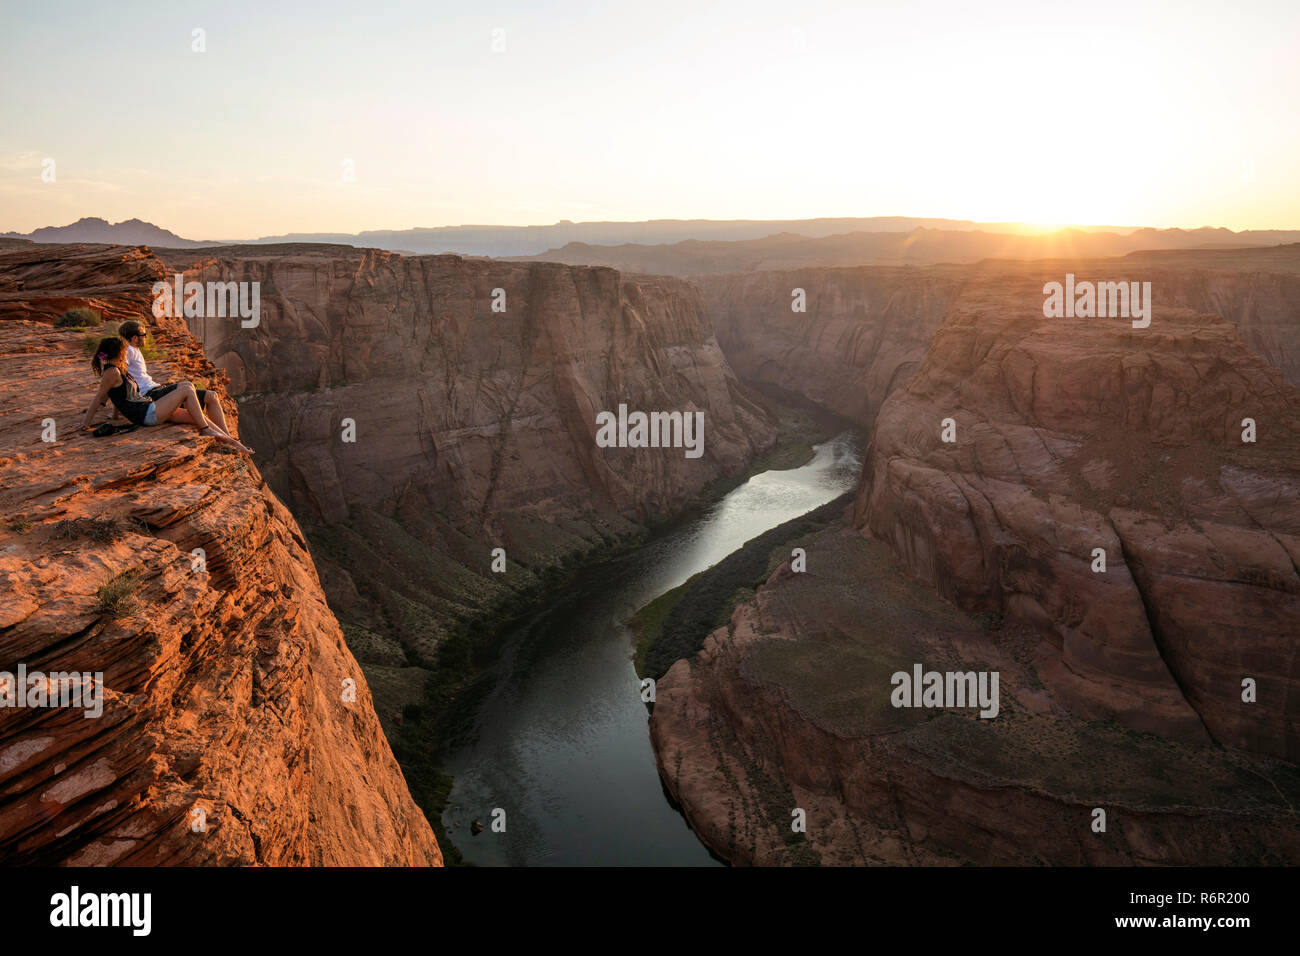 Zwei Touristen schauen sich den Sonnenuntergang an, Horseshoe Bend, Colorado River, Page, Arizona, USA - Stock Image